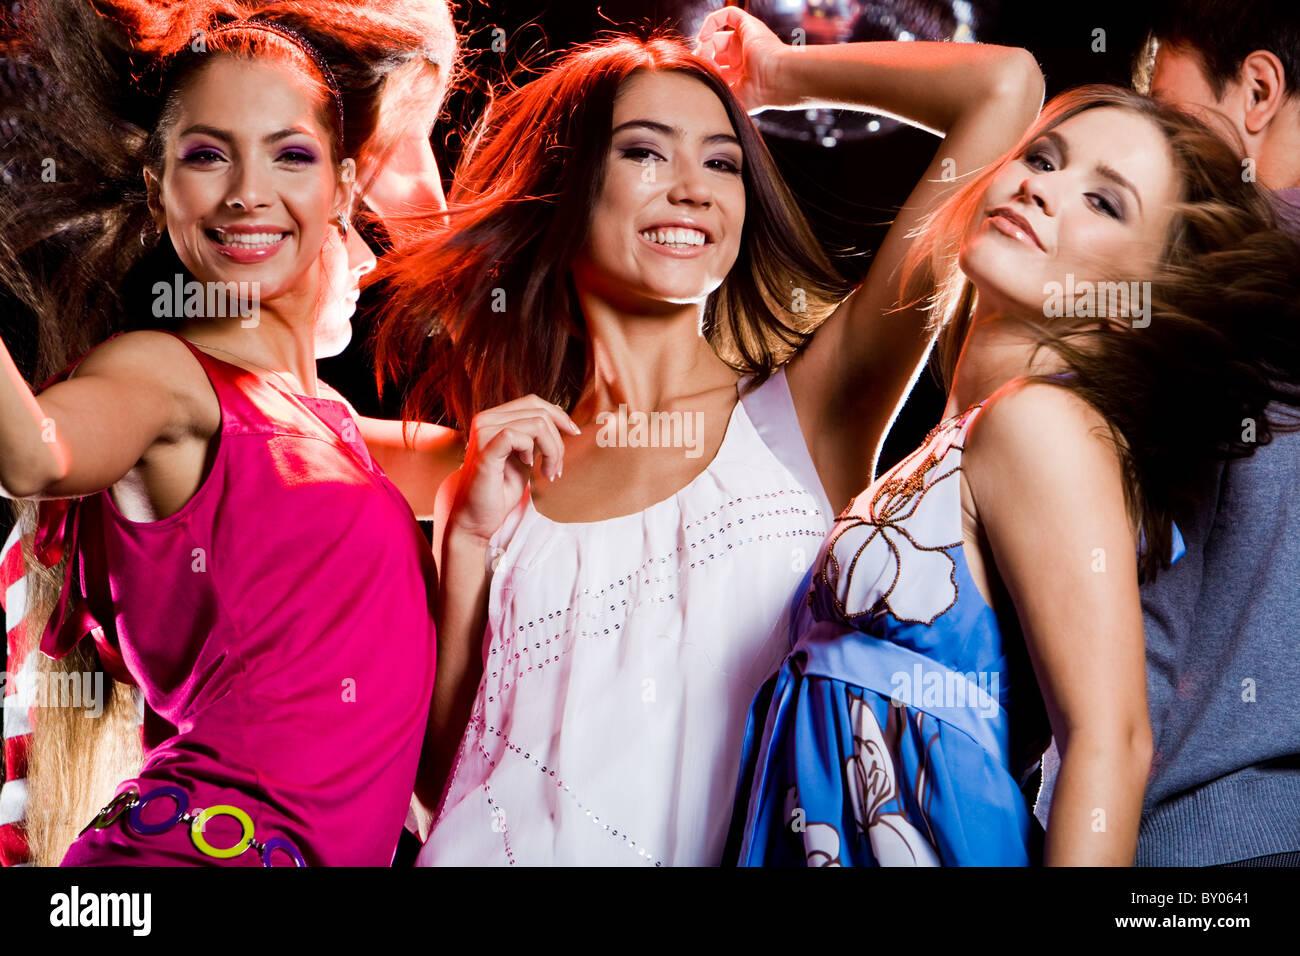 Three glamorous girls having fun at disco in night club - Stock Image